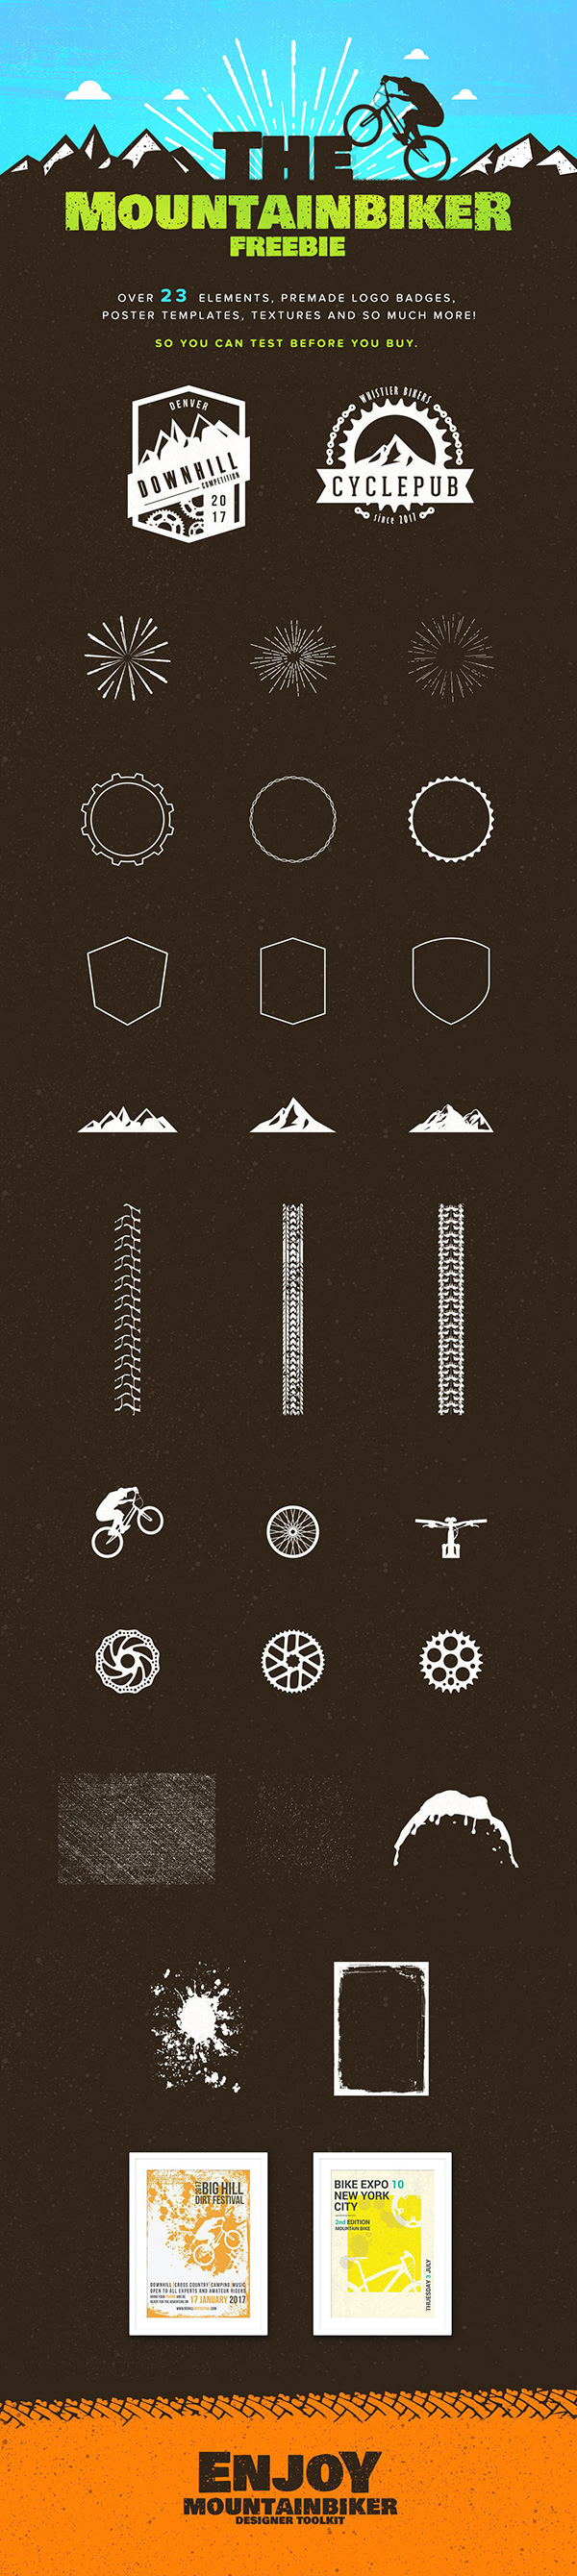 the-mountainbiker-designer-toolkit-600